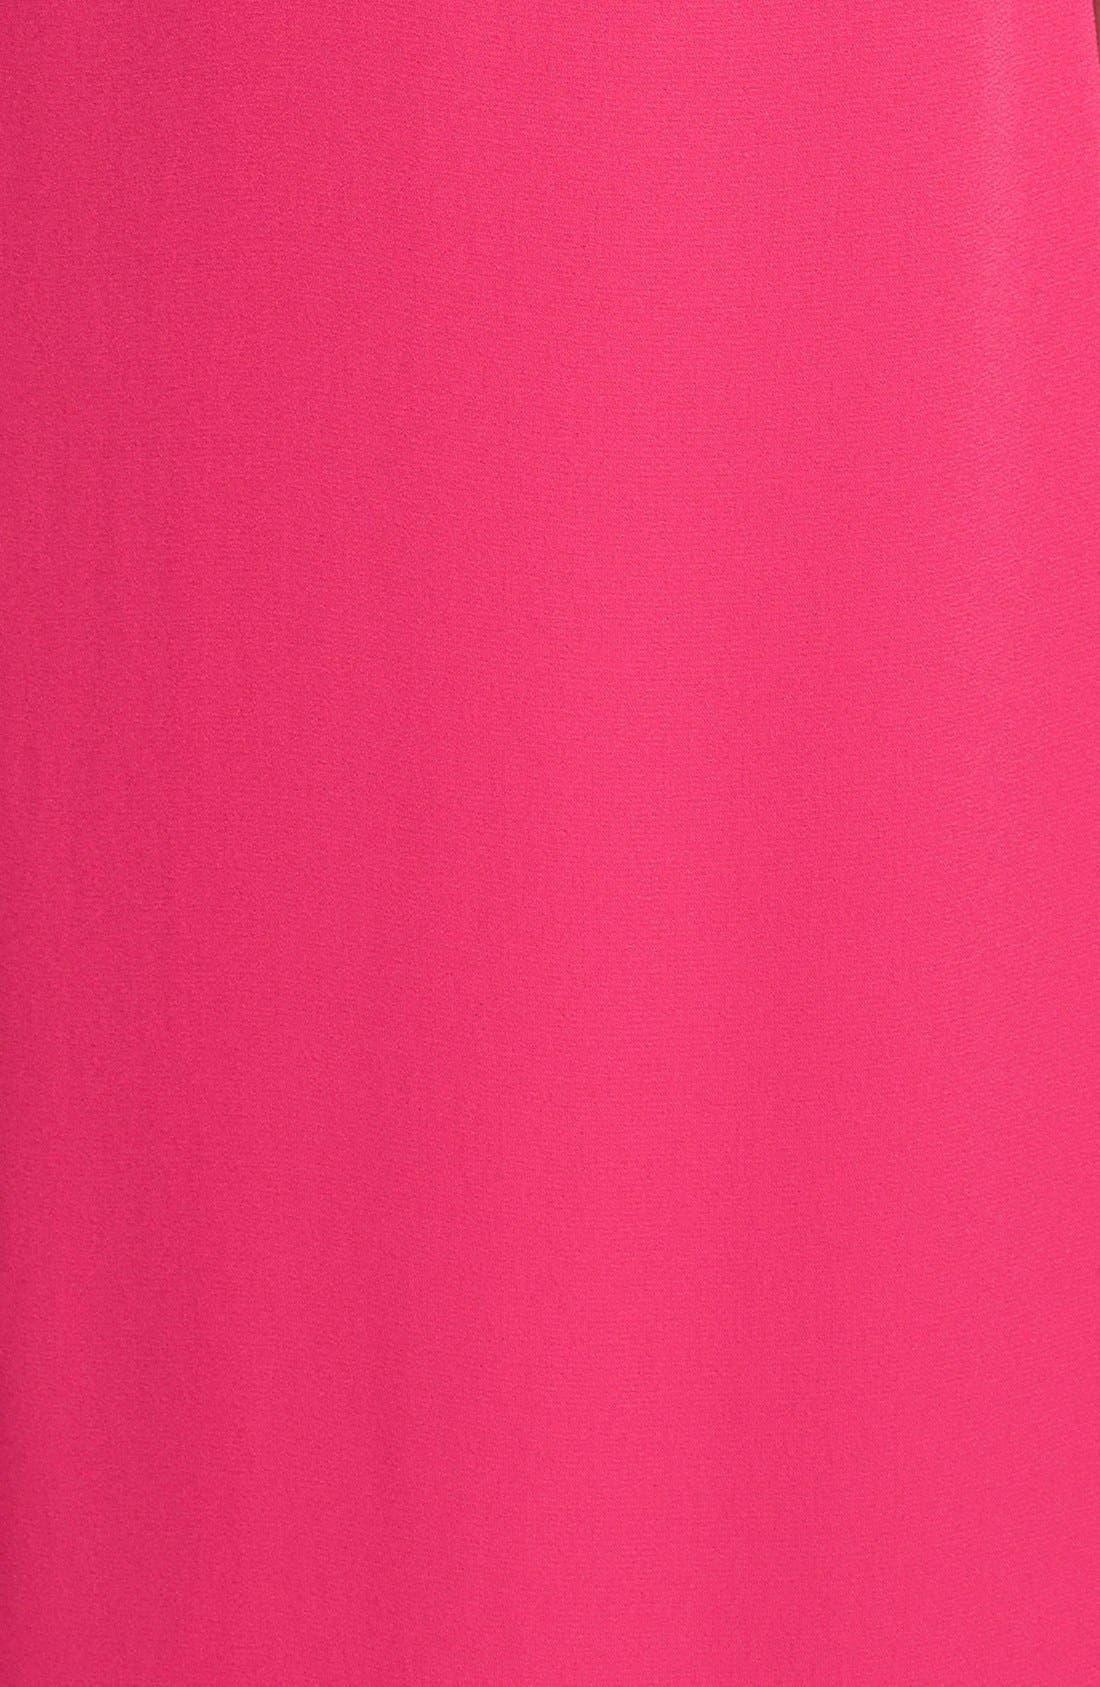 Alternate Image 3  - BCBGMAXAZRIA 'Ivana' High/Low Georgette Dress